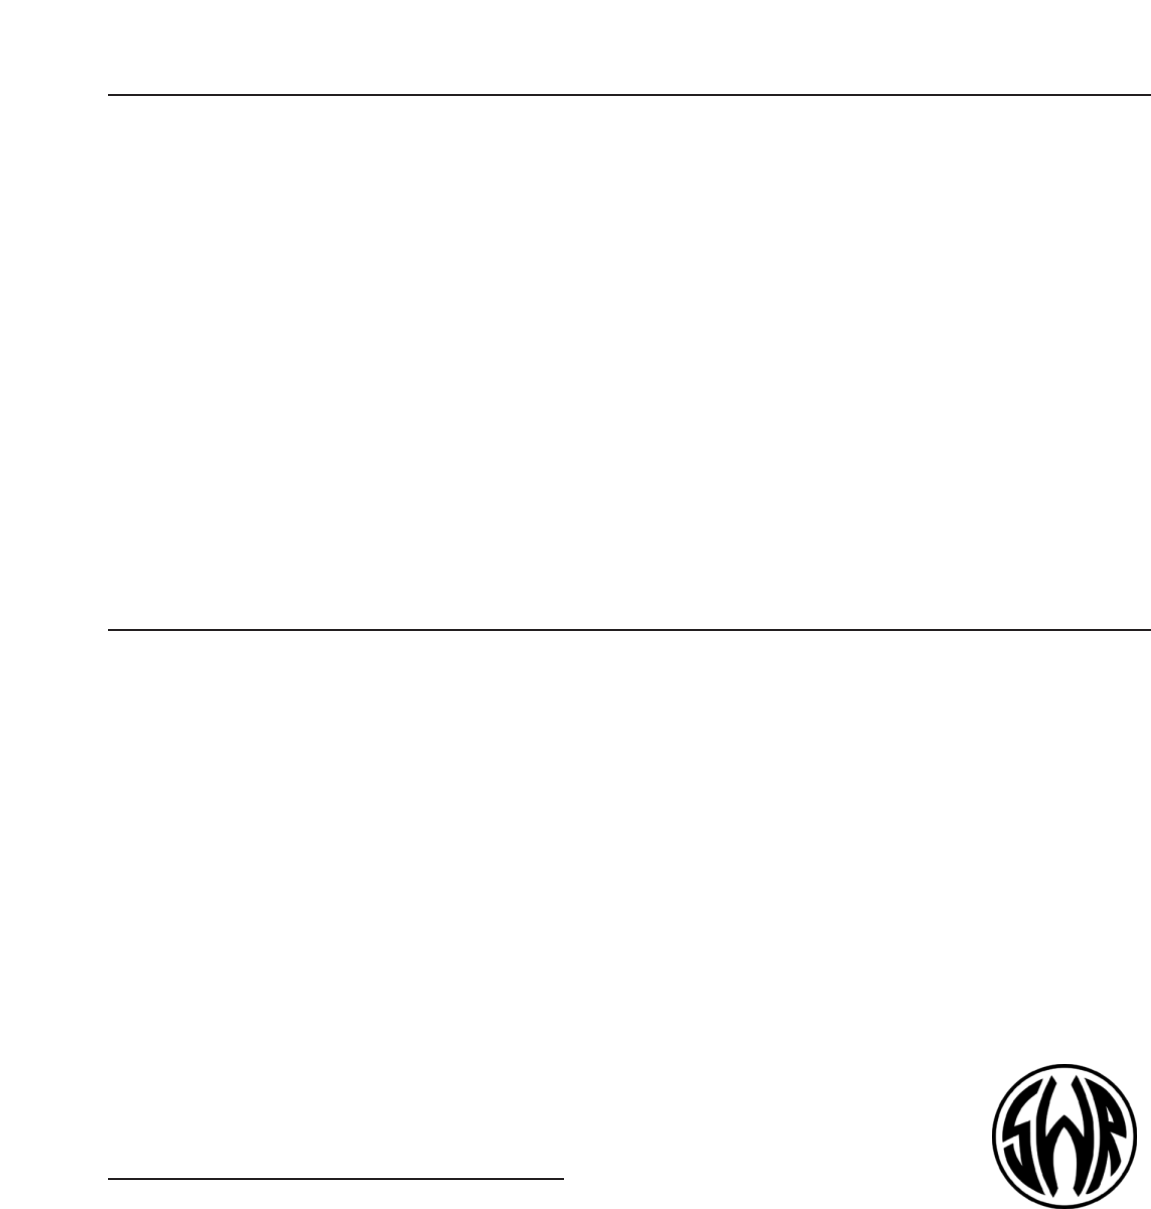 Swr Sound Super Redhead Users Manual